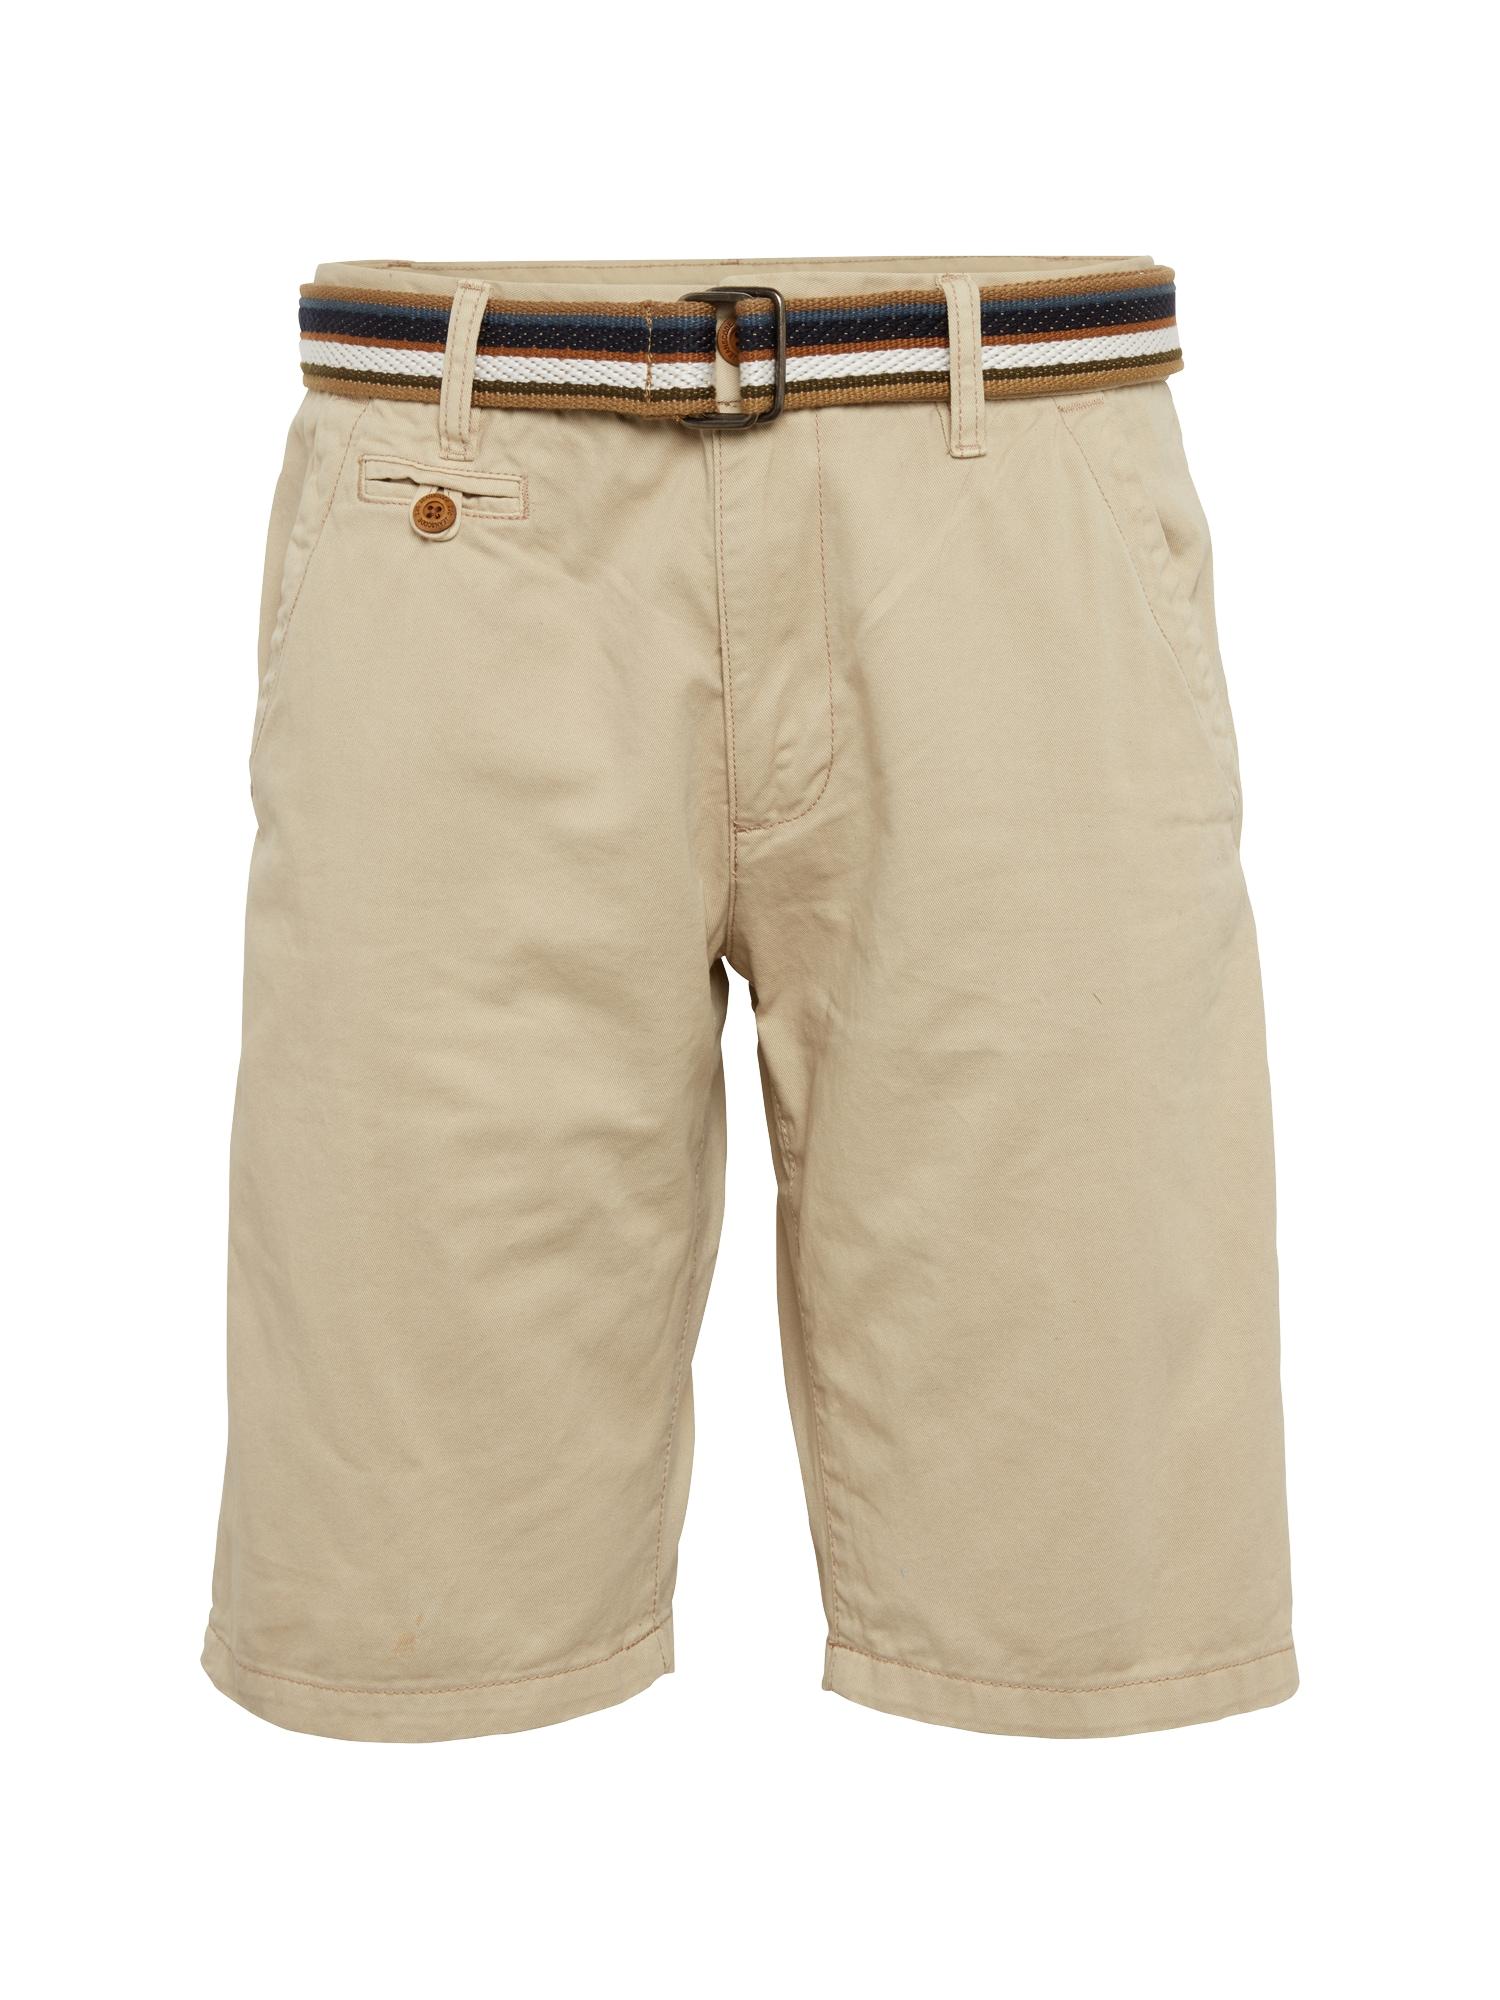 "INDICODE JEANS ""Chino"" stiliaus kelnės 'Royce' gelsvai pilka spalva"